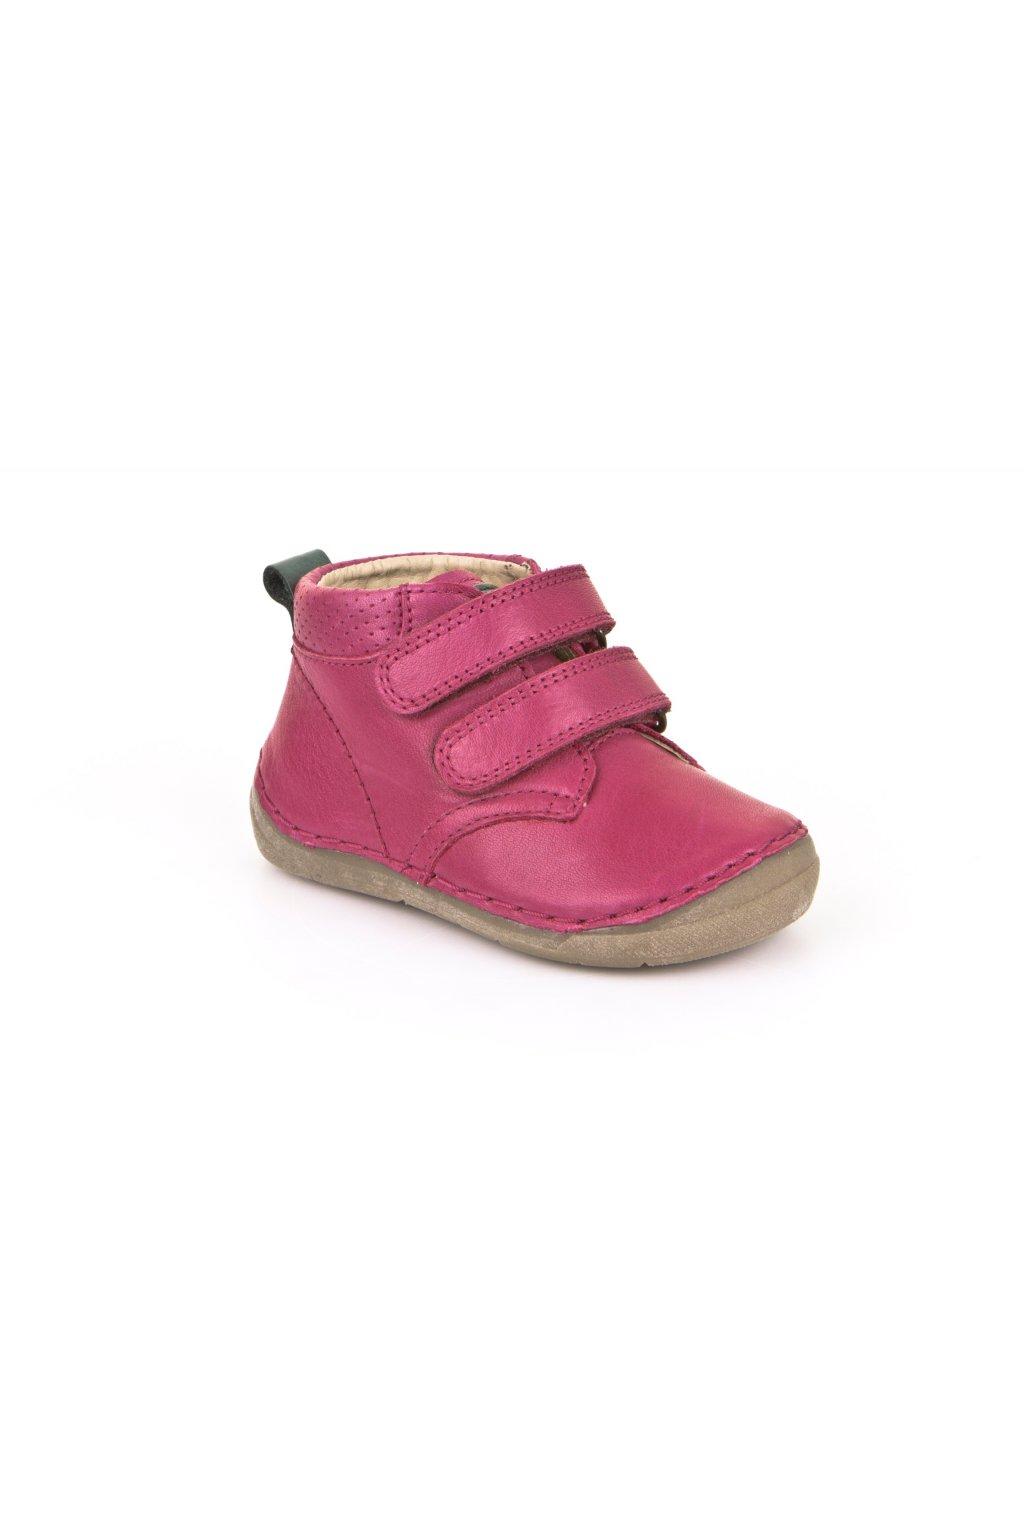 Froddo shoes Fuchsia